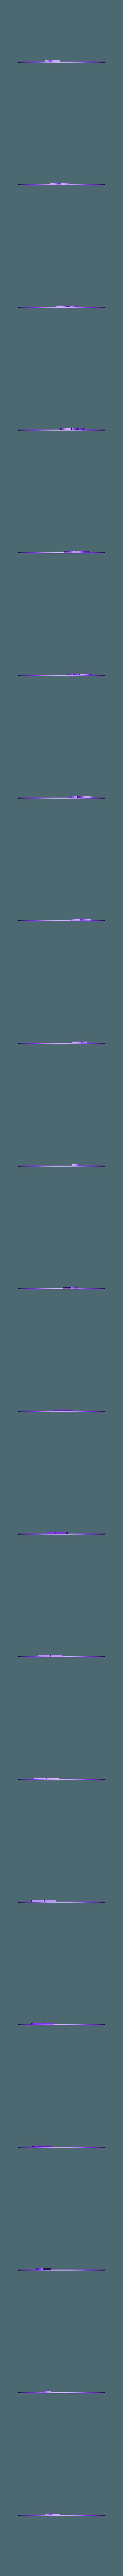 Uta_jazz_yellow.STL Download free STL file Minimal Multi-color NBA coasters • 3D print object, MosaicManufacturing